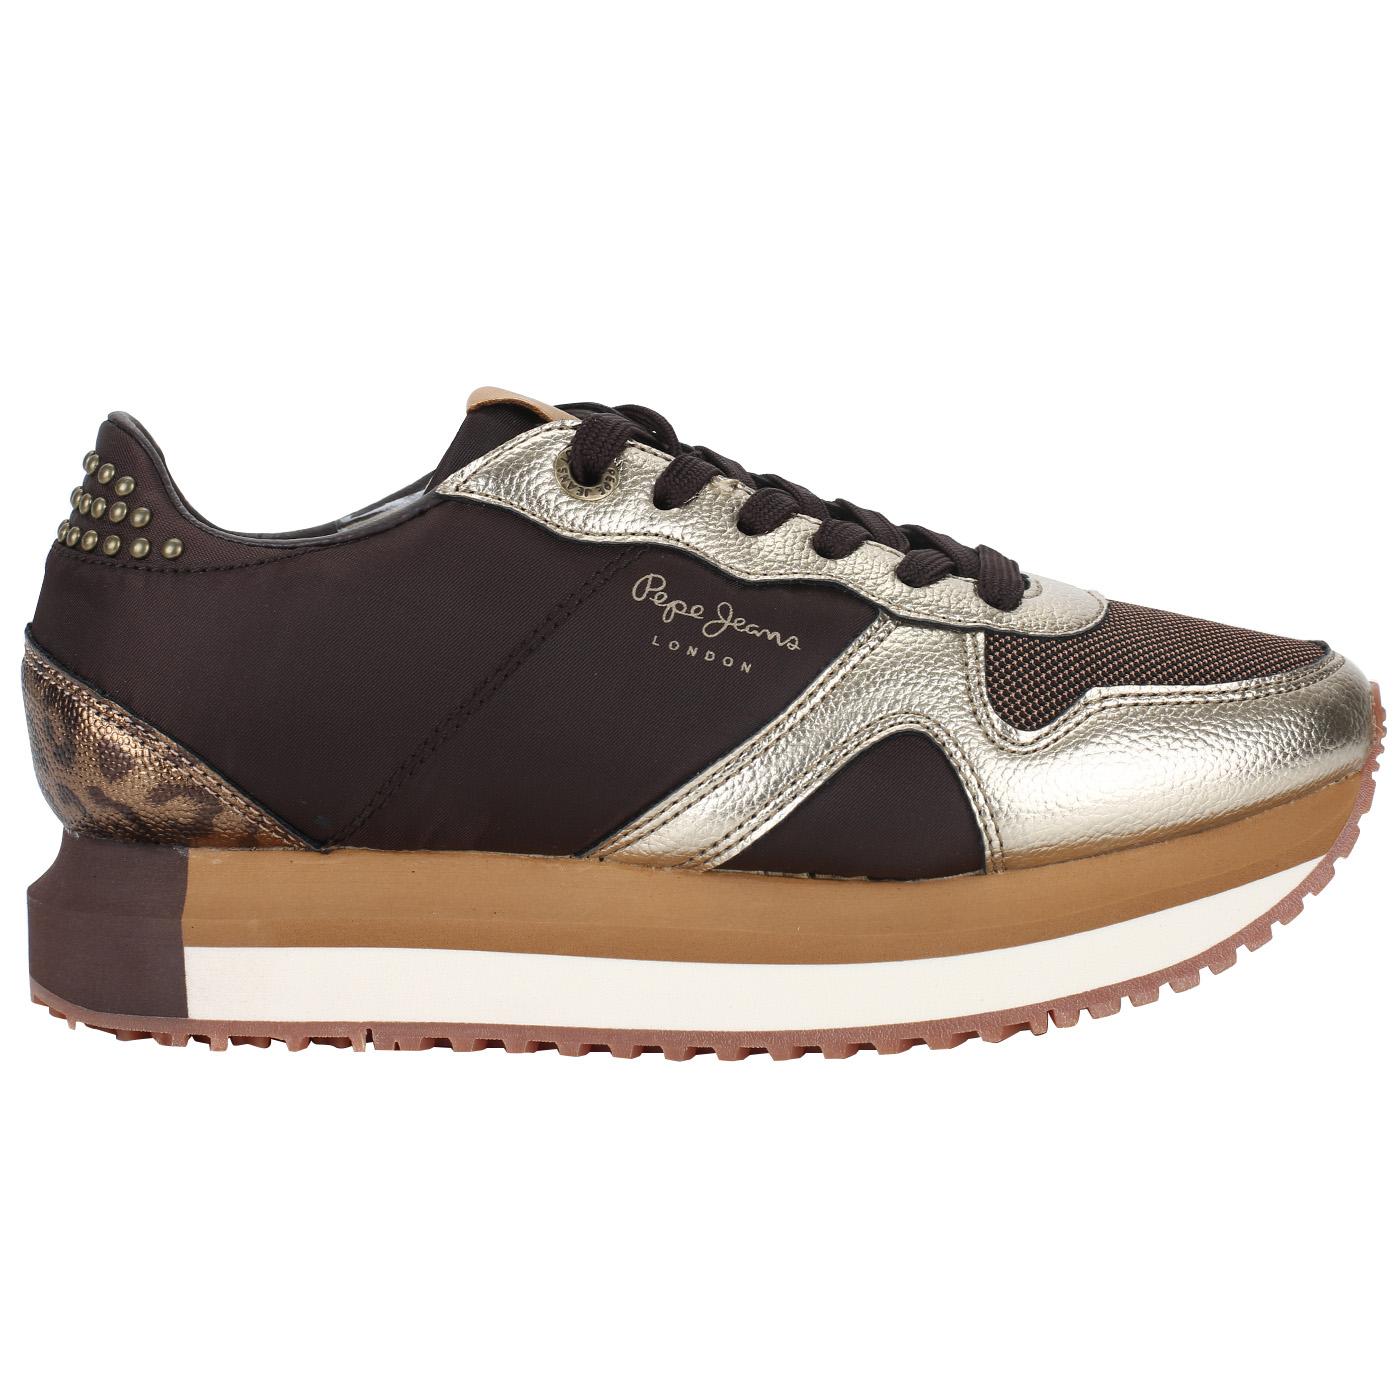 09bb0ce6 Кроссовки-сникеры Pepe Jeans London Zion Studs PLS30787_dark brown ...